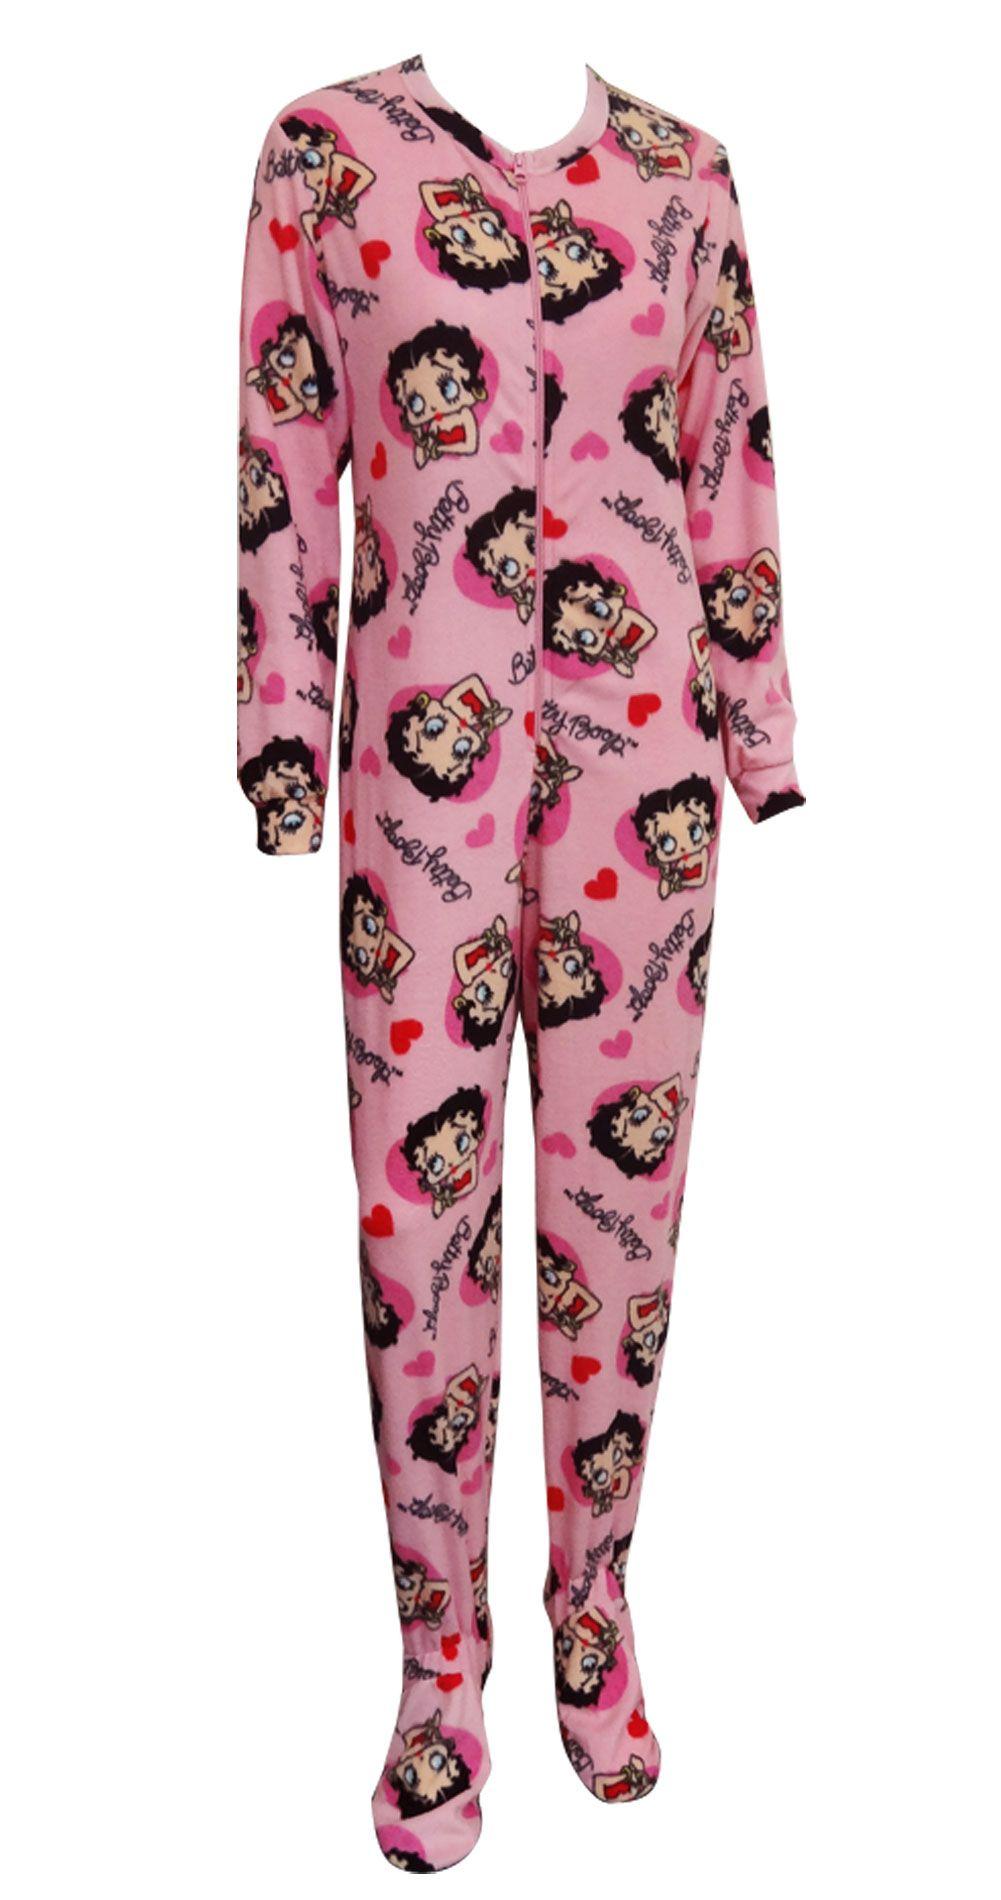 db97fbe5f3 ... lace up in 2ea56 1794d Betty Boop Pink Fleece Footie Onesie Pajama Betty  Boop is better ...